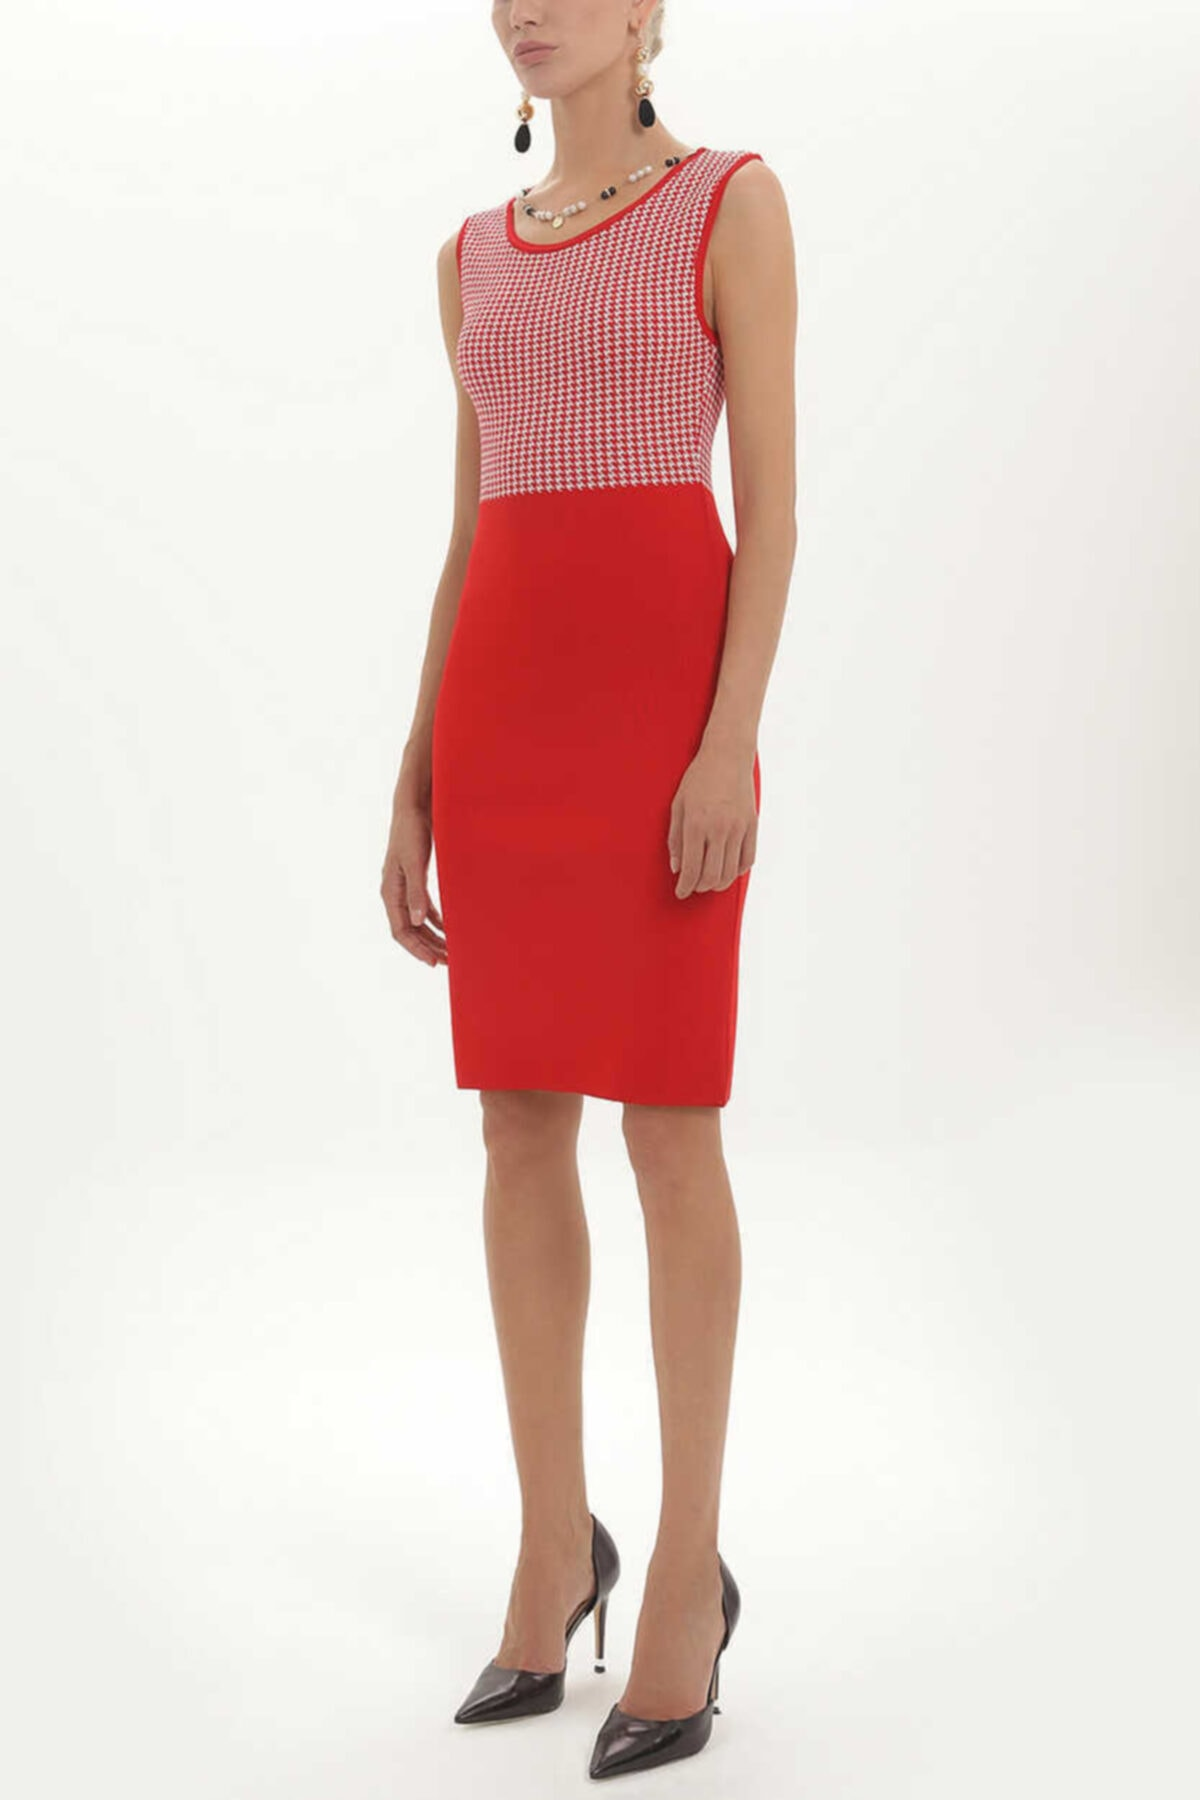 SOCIETA - Dar Kesim Kolsuz Triko Elbise 27937 Kırmızı 1